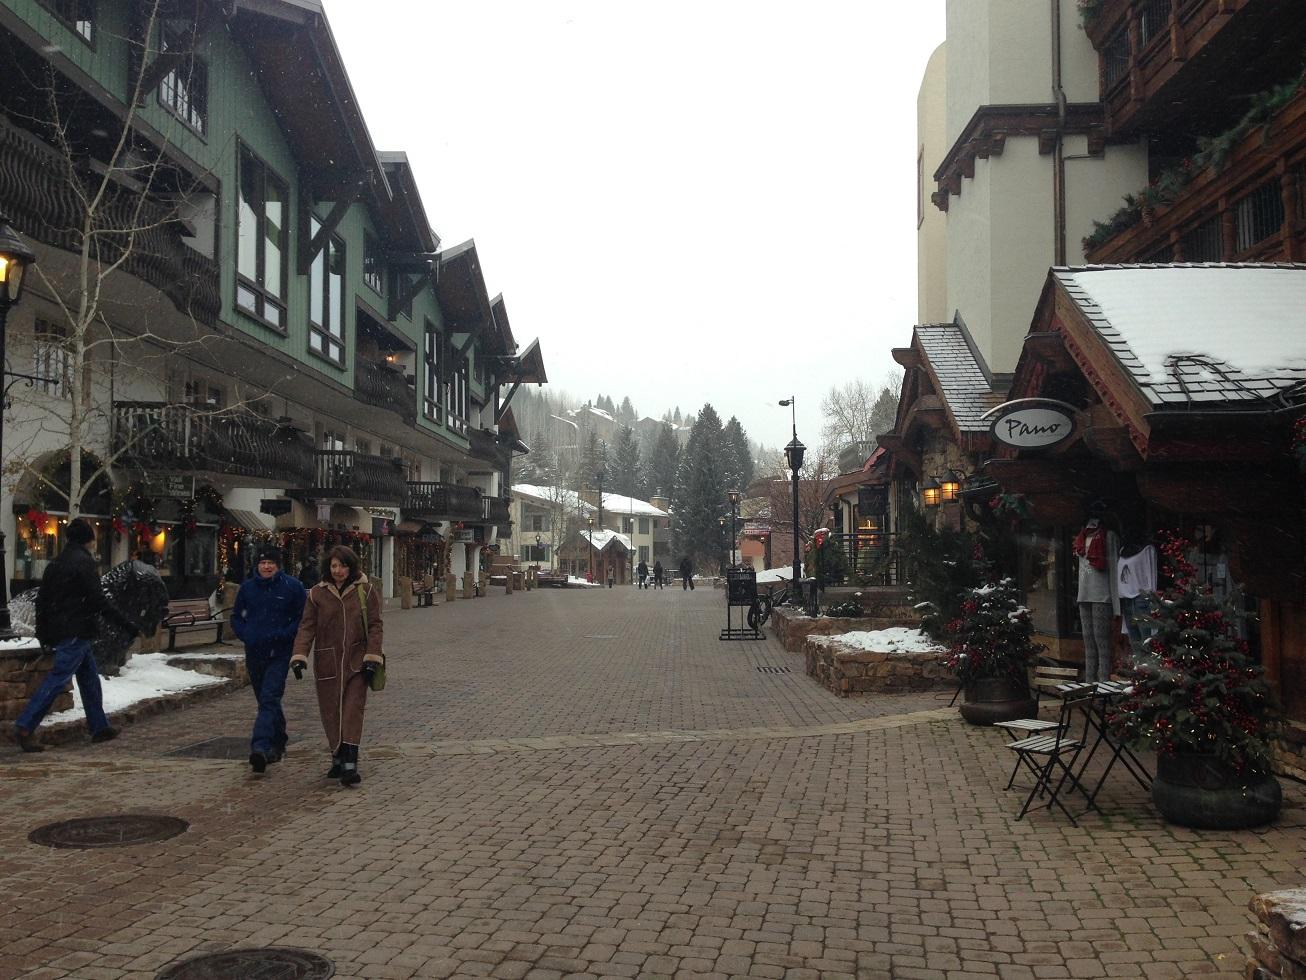 Vail滑雪场 (13).JPG